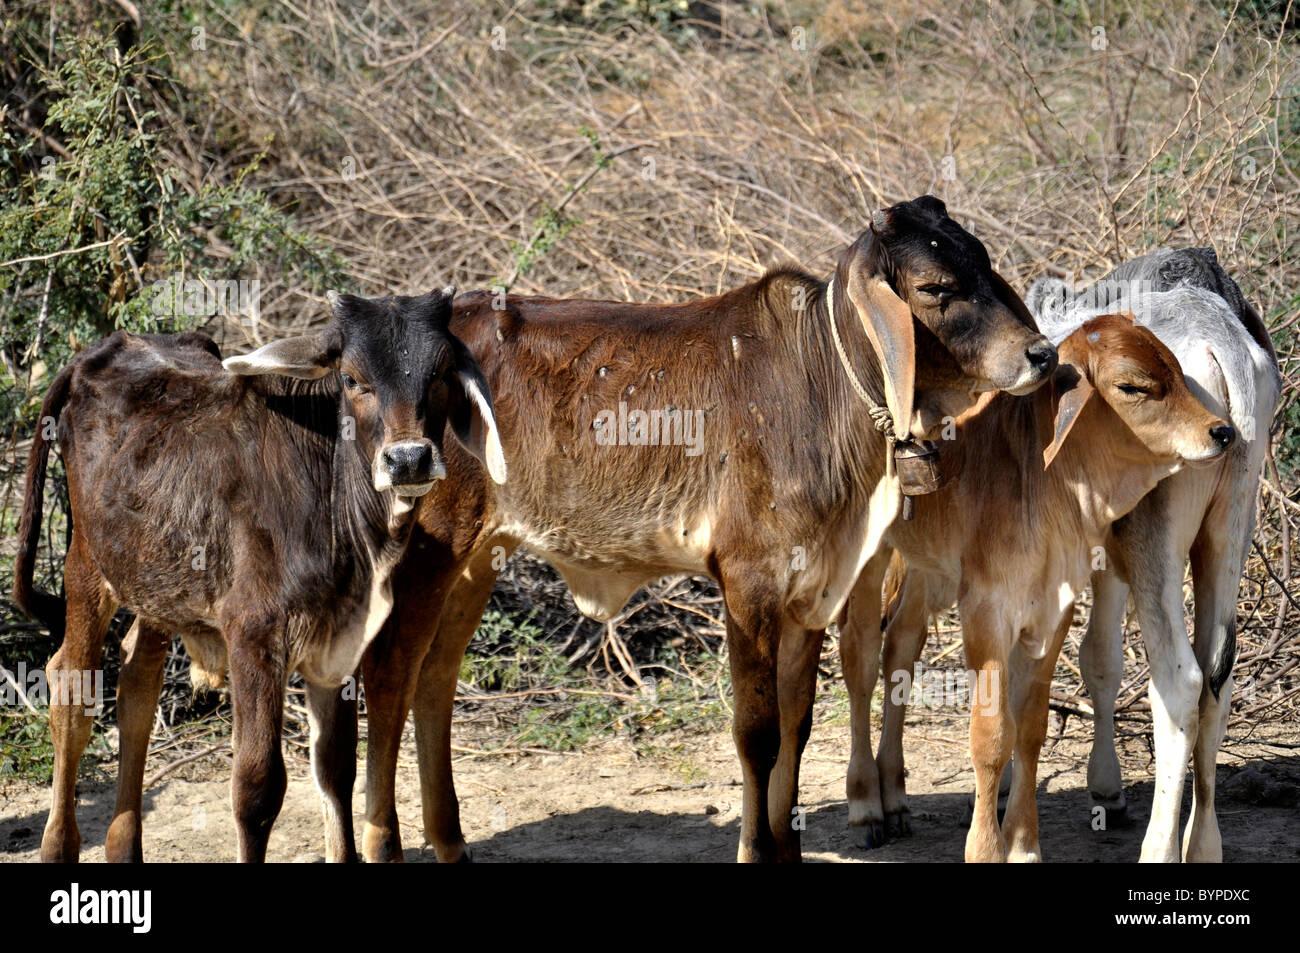 Calf - Stock Image